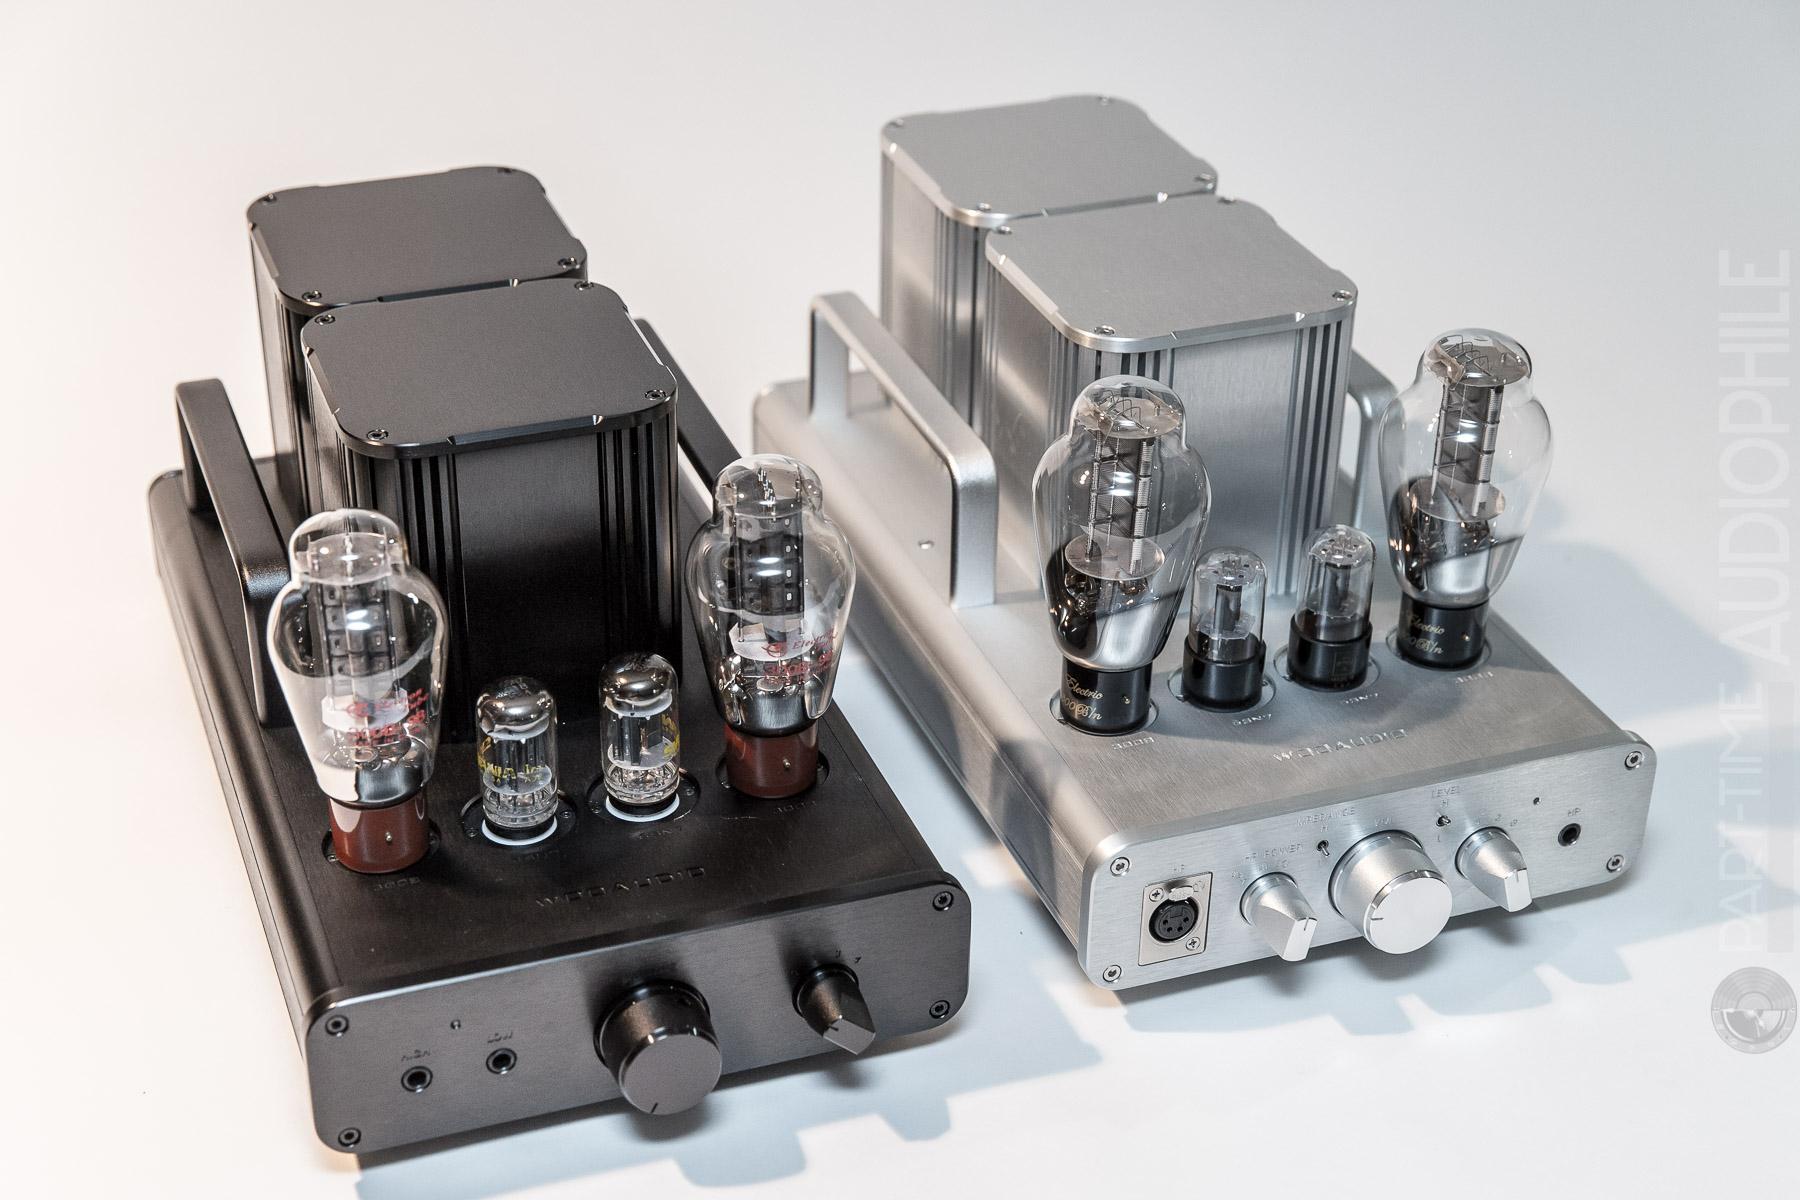 Review: Woo Audio WA5LE v2 vacuum tube headphone amplifier | Part